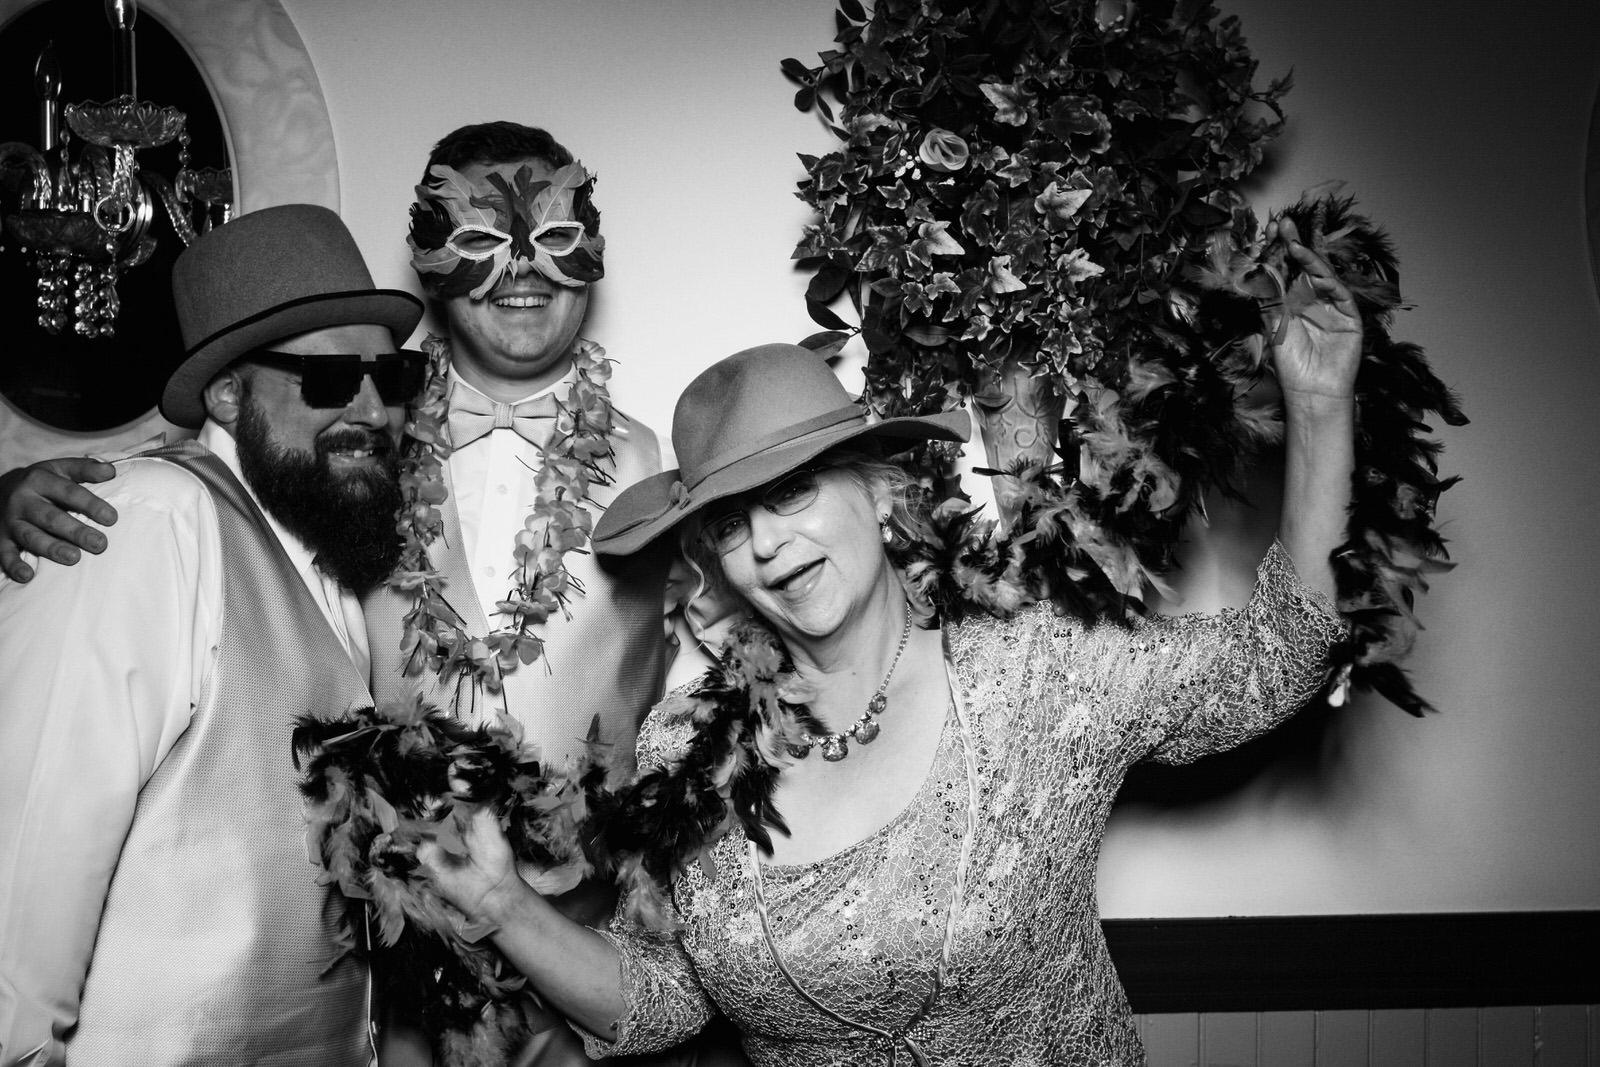 Ryan-Christine-Wedding-Photo-Booth-16.jpg